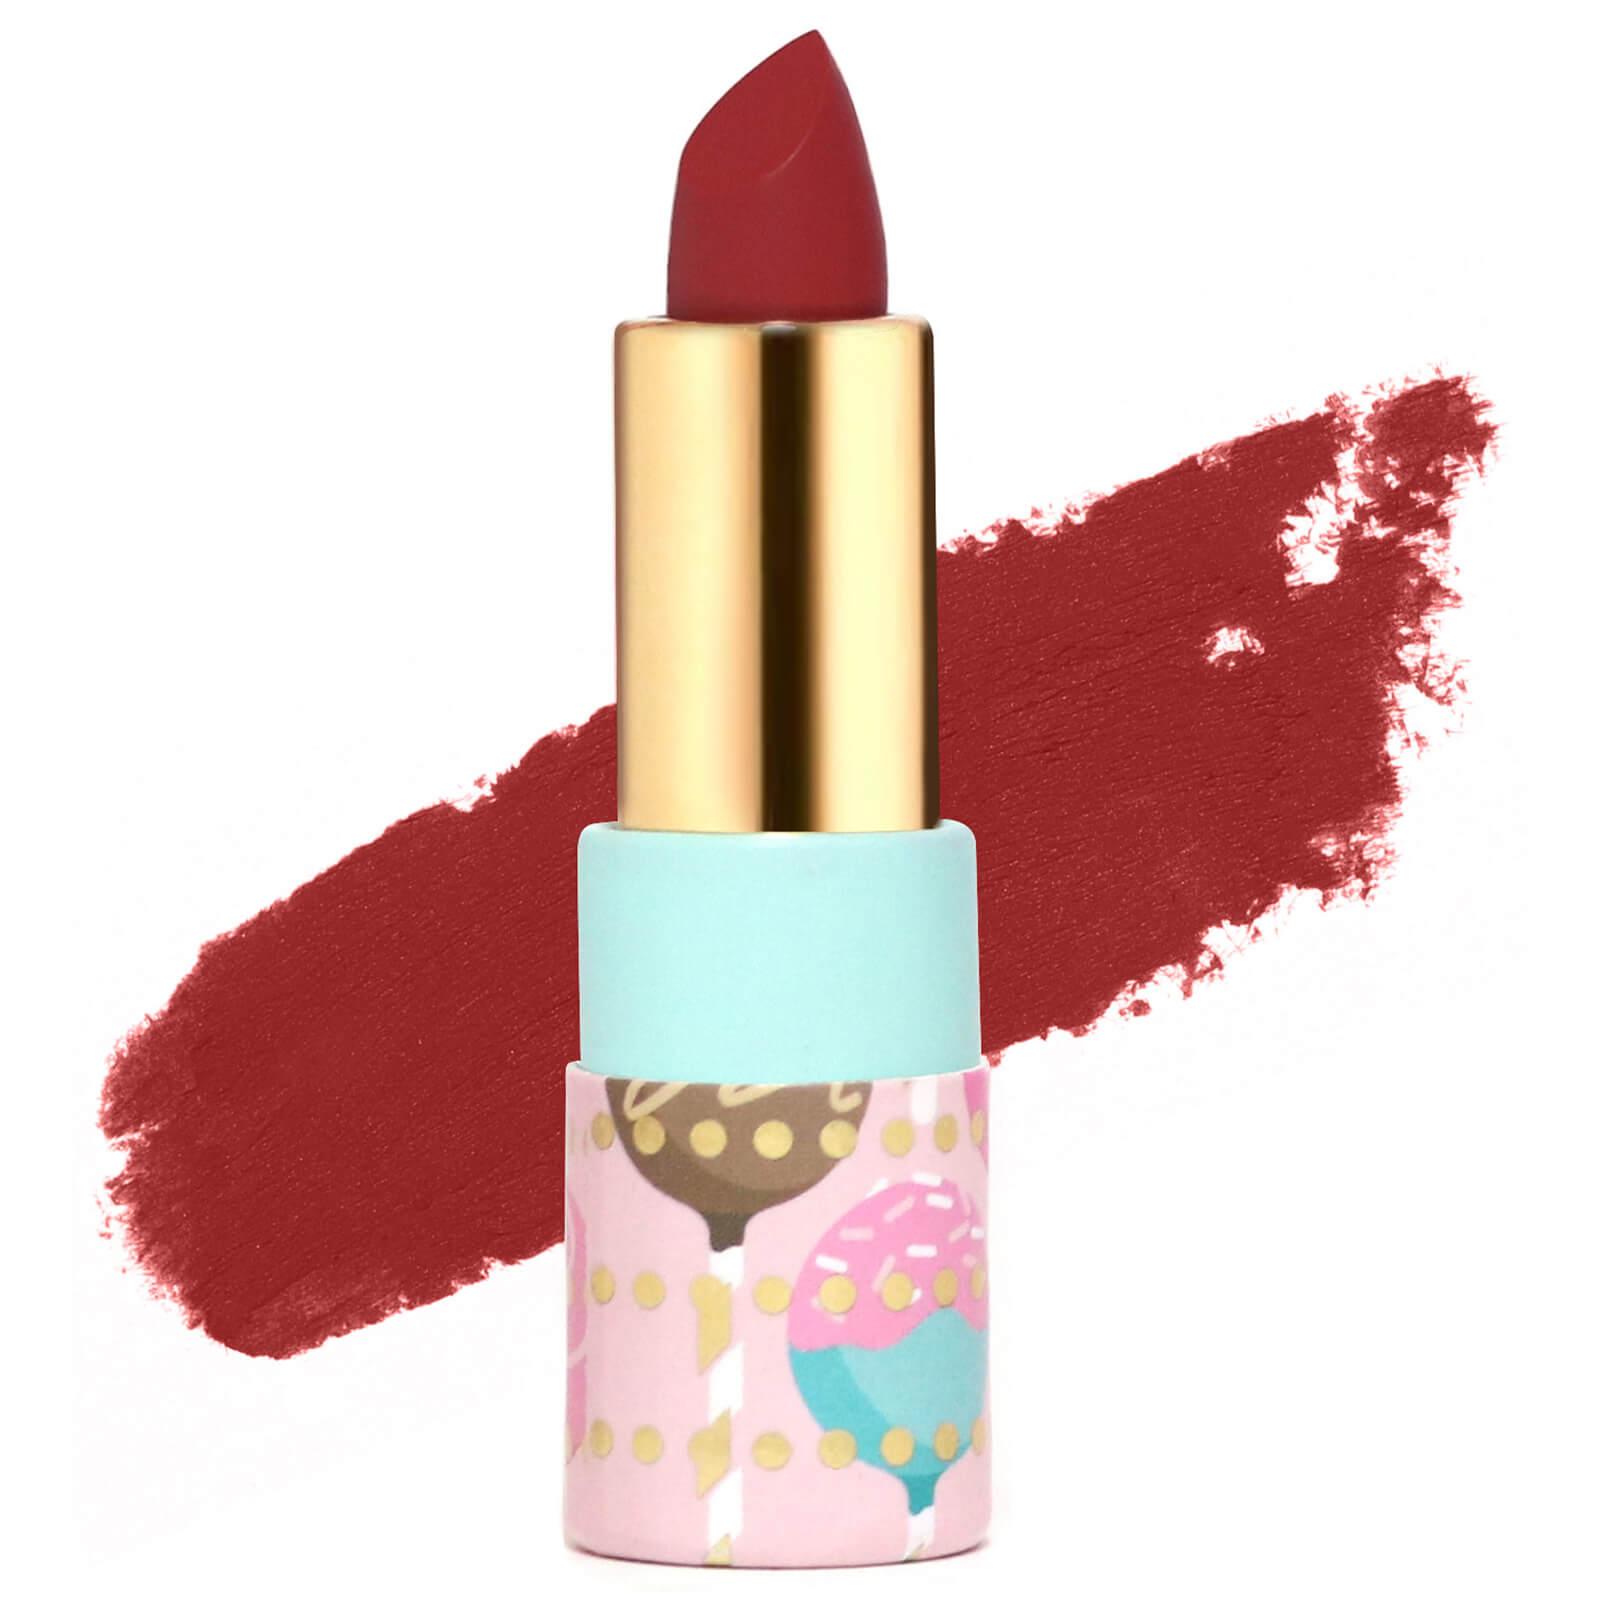 Купить Beauty Bakerie Cake Pop Lippies 0.05oz (Various Shades) - Cherry Bomb